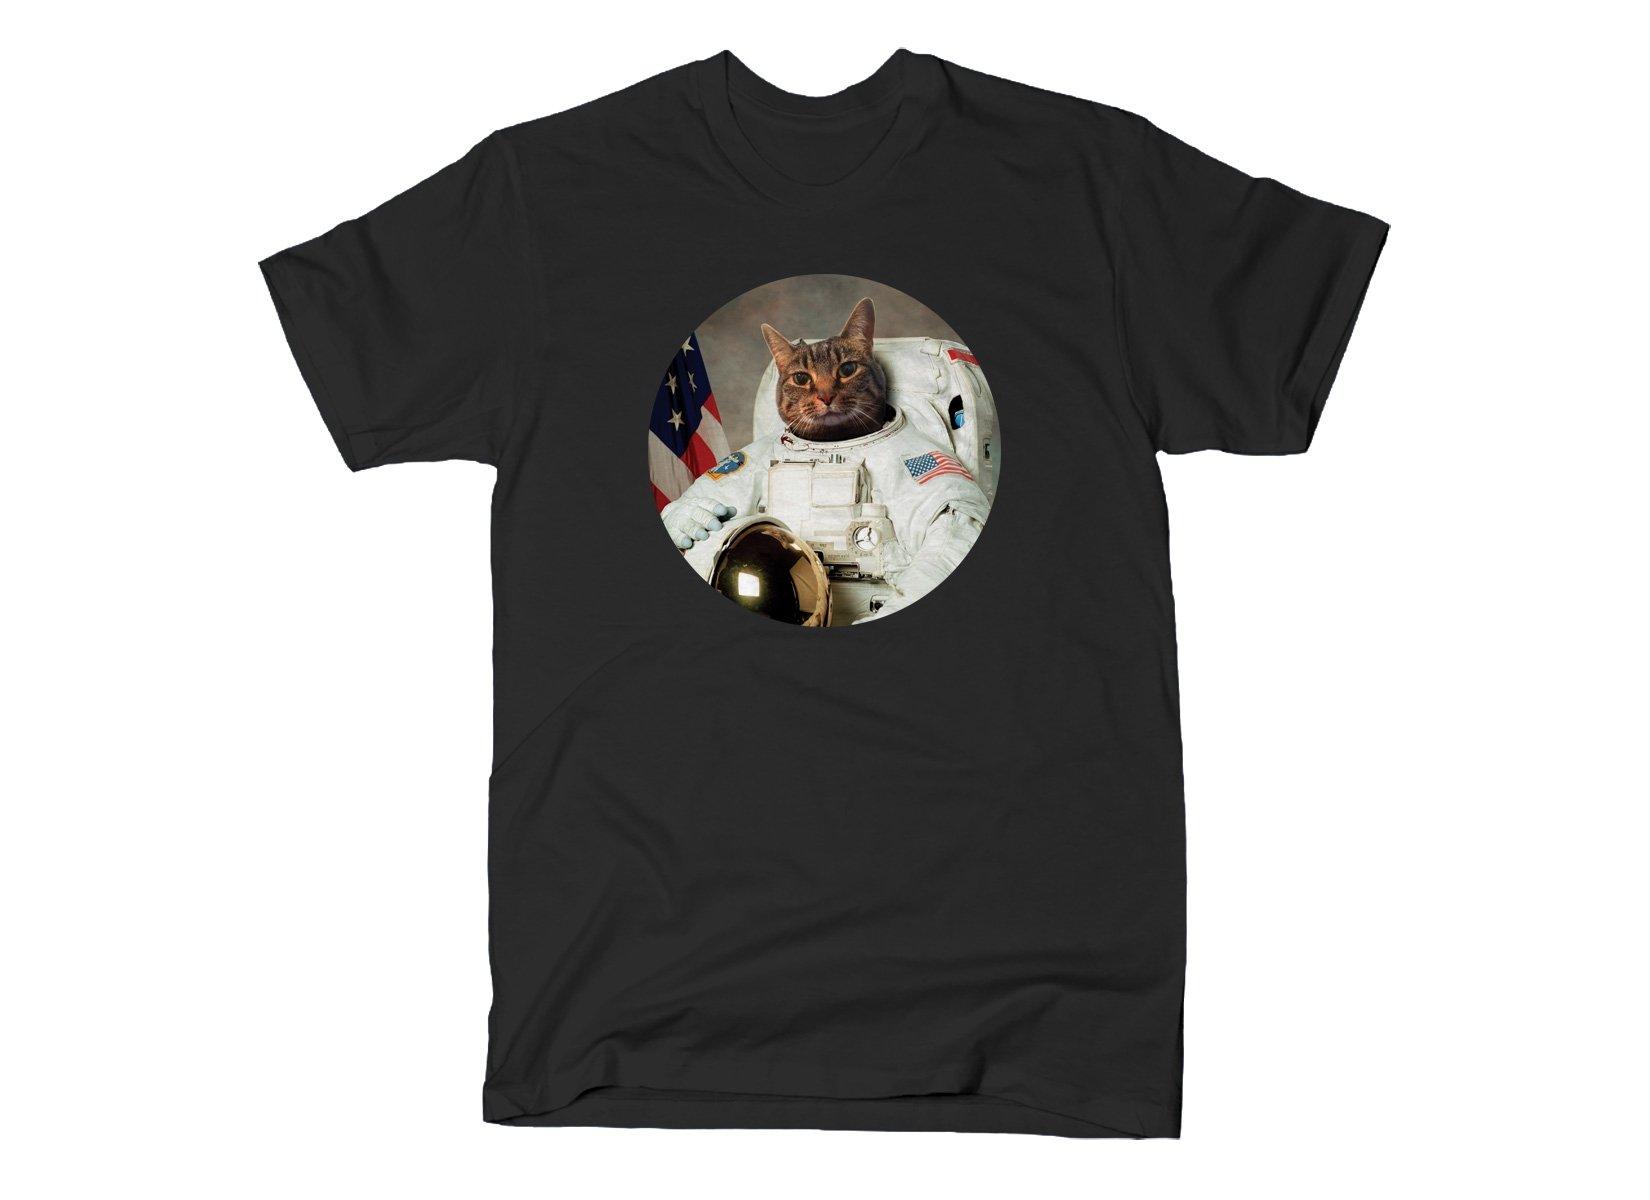 Astrocat on Mens T-Shirt